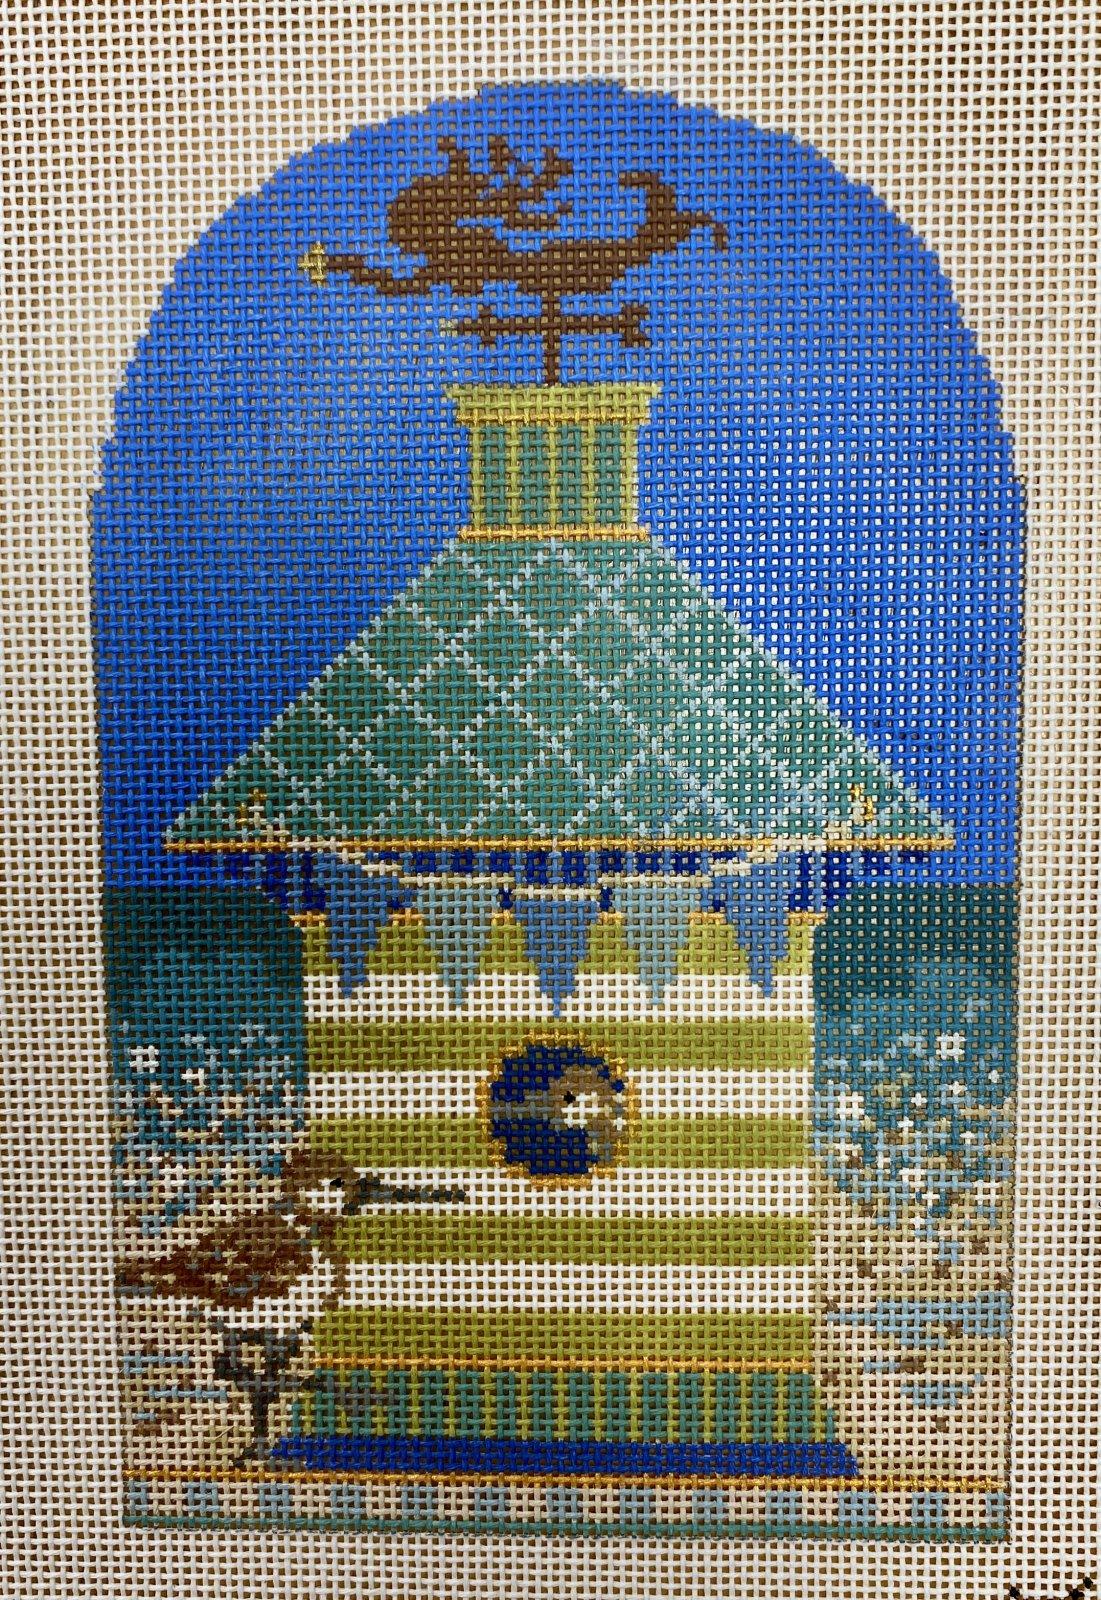 mermaid sandpiper house